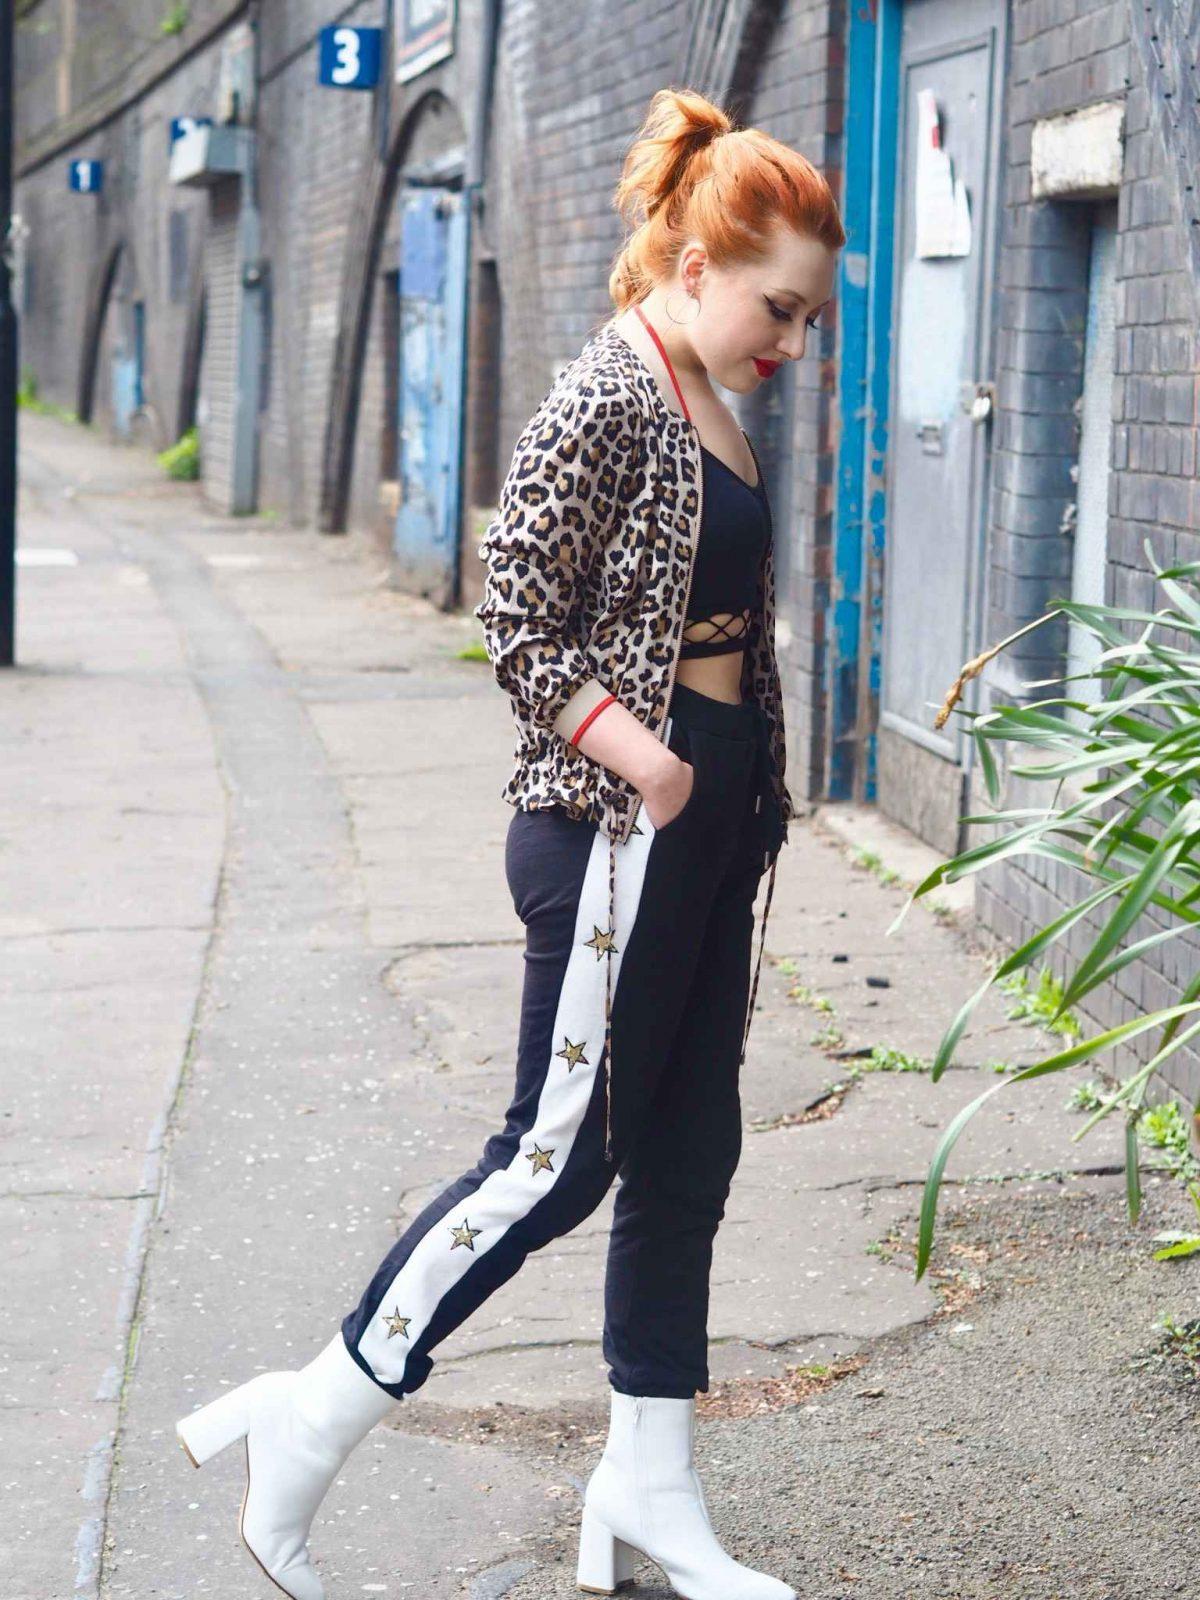 Blogger Twenty-Something City wears athleisure sports luxe trend